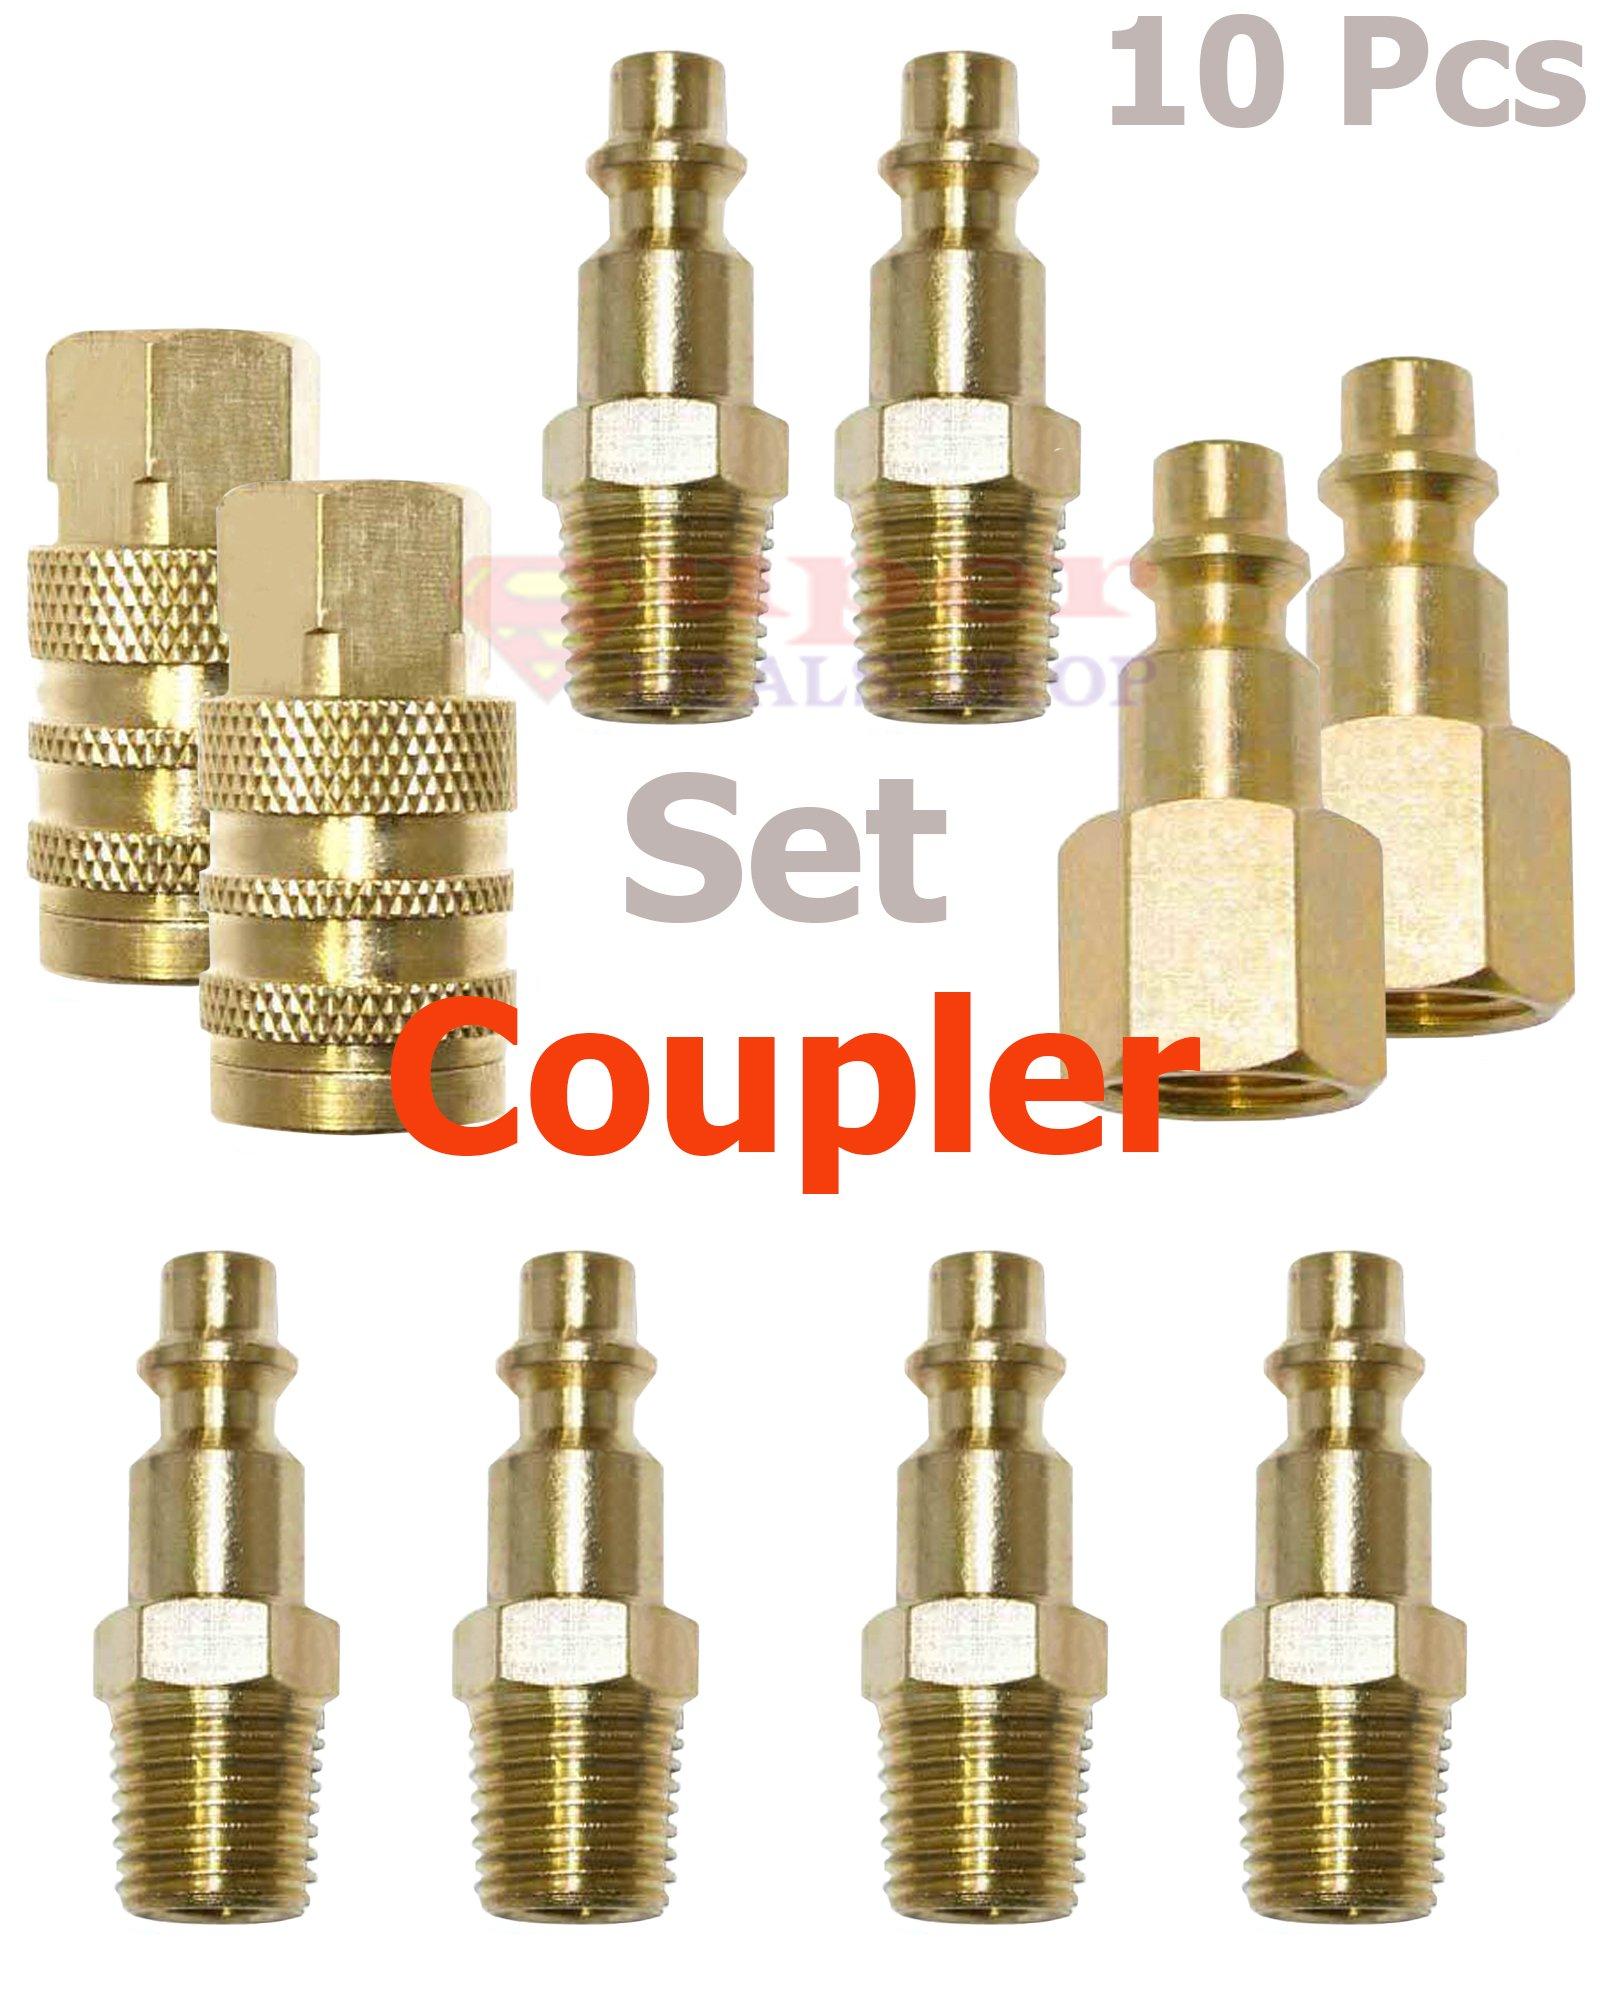 10 Pcs Brass Industrial Coupler & Plug Kit Adapter/Connector Set Quick Connect/Disconnect W-series Coupling Air Hose Fittings Compressor 1/4 NPT Male/Female Super-Deals-Shop